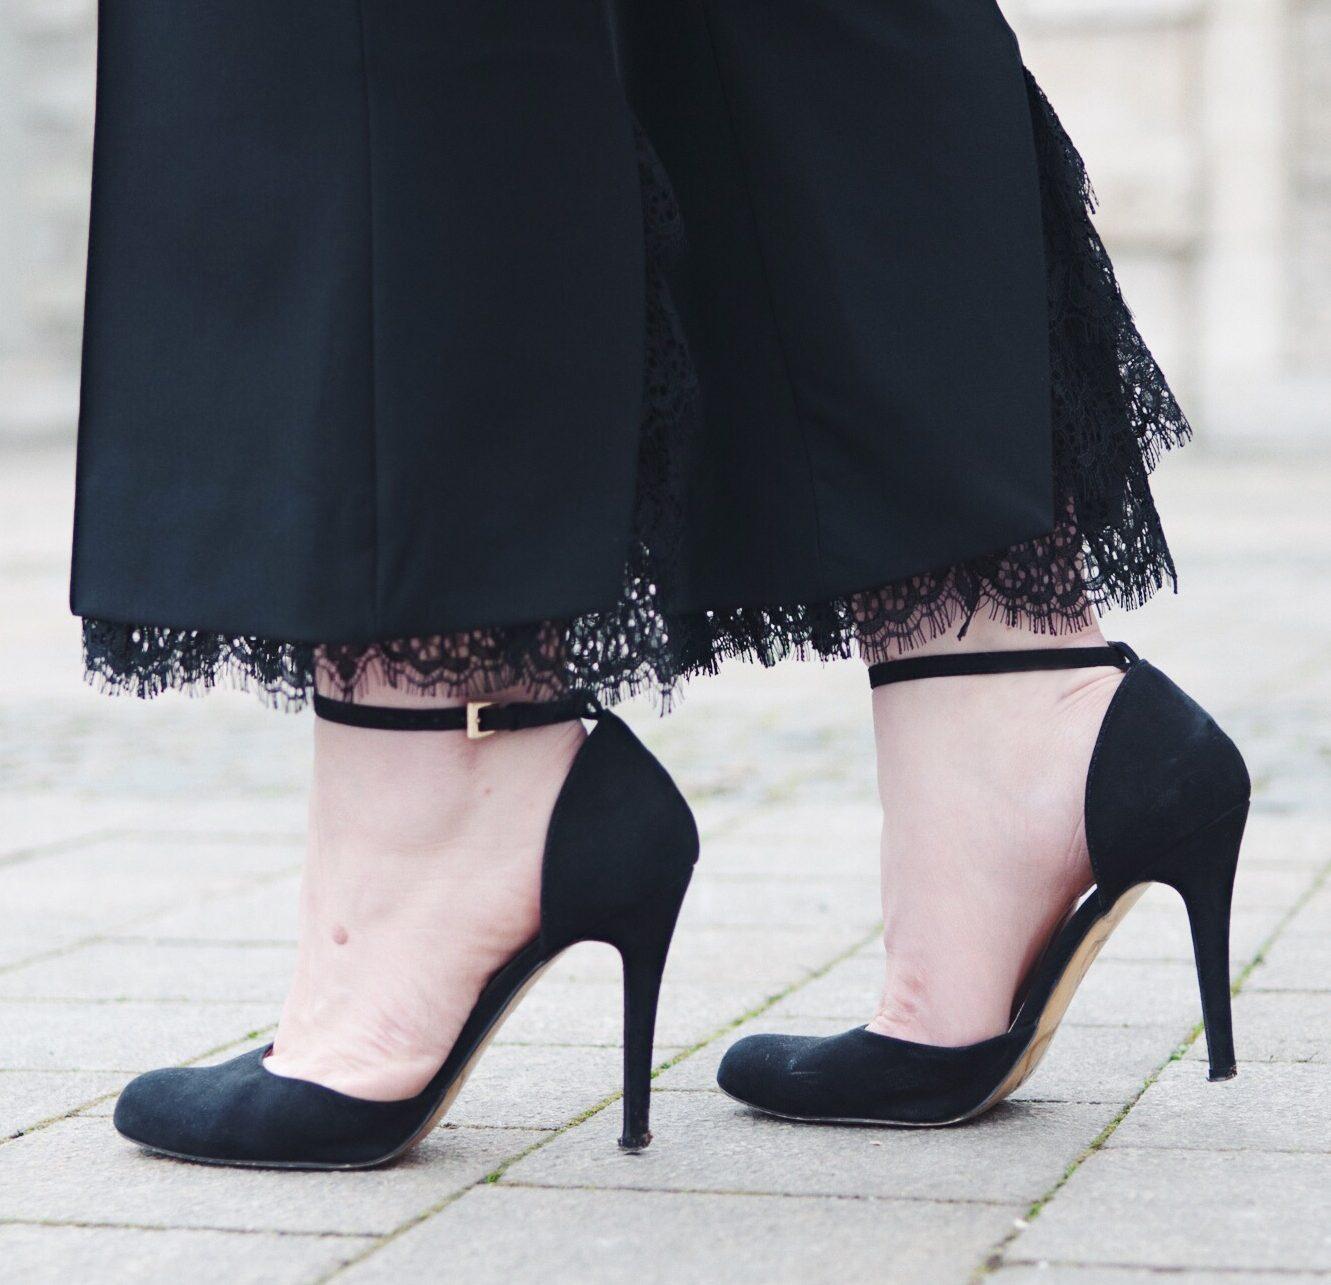 Pumps, Zara, Lace, Hose, High Heels, Absatz, Schwarz, Muenchen, Munich, Pineapples and Pumps, Fashion Blog, Fashion Blogger, Blogger, Modeblogger